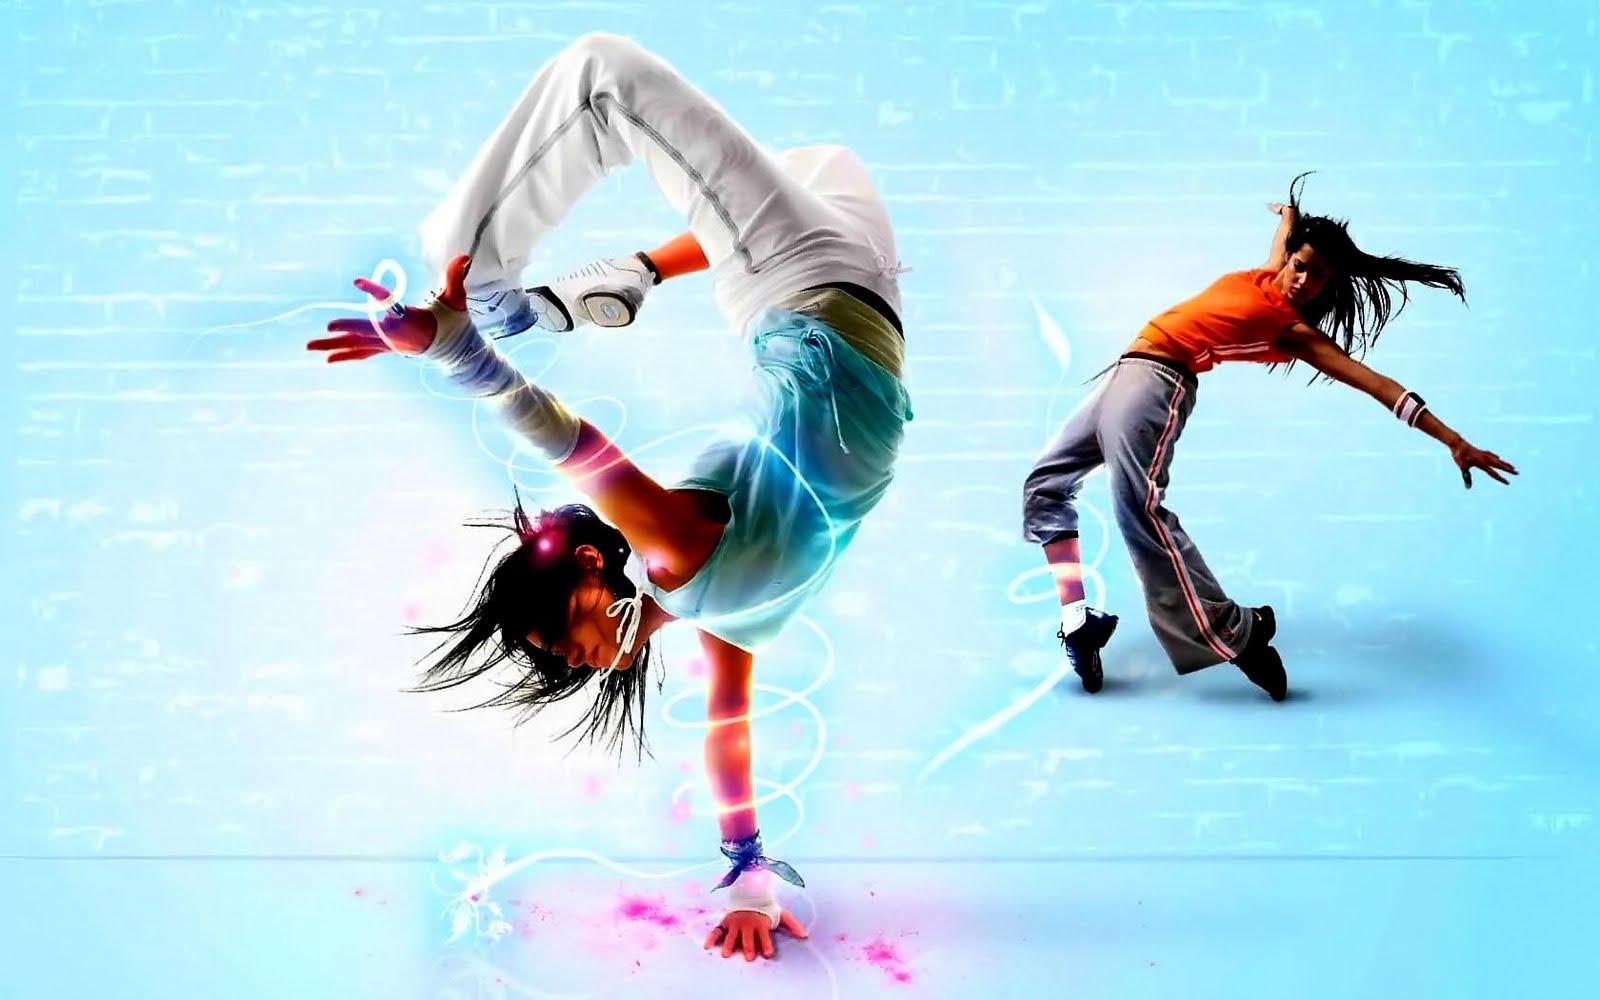 http://2.bp.blogspot.com/-YITRdvXtDmU/Ttxmla2uzzI/AAAAAAAAAj4/VjFyzlMnQ4k/s1600/dance-hd-5-729210.jpg